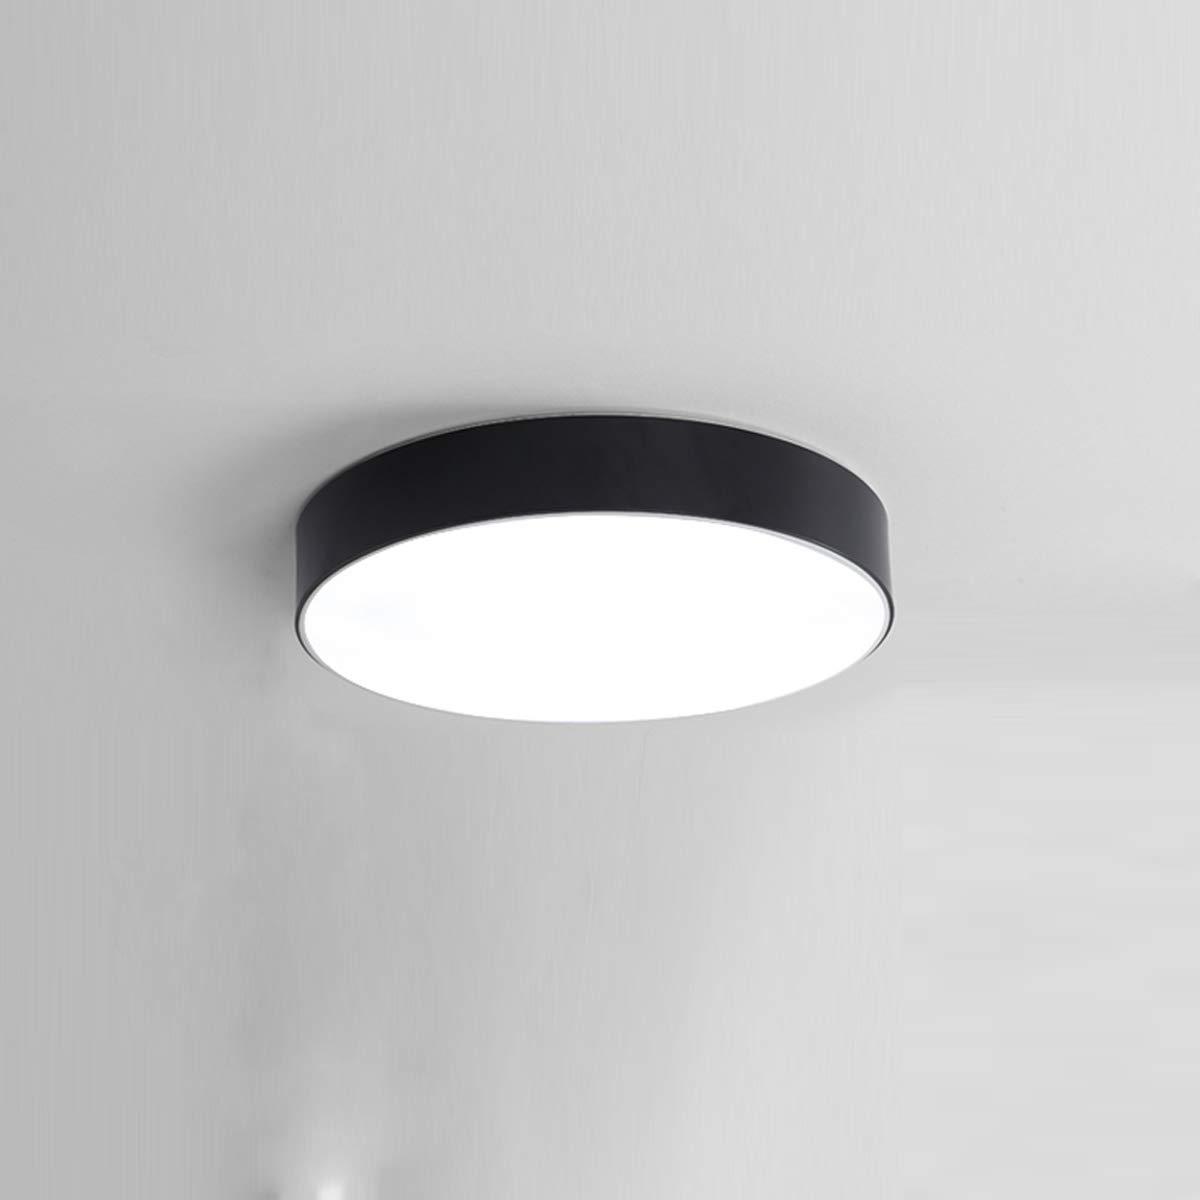 Amazon.com: GlanzLight GL-61503-B - Lámpara de techo simple ...